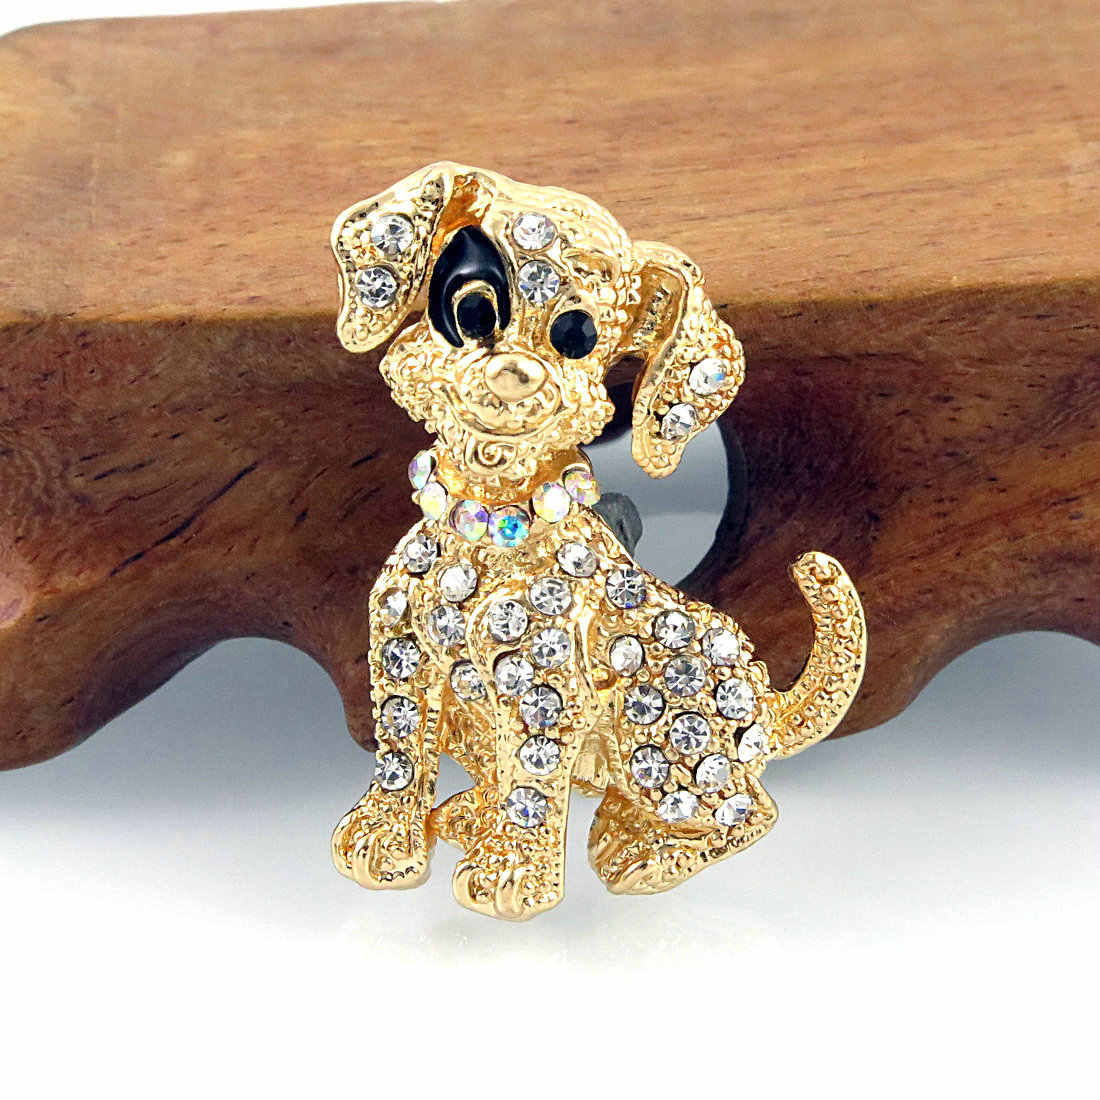 Fashion Warna Emas Anjing Bros Rhodium Berlapis Hewan Bros Berlian Imitasi Berkilau Pin Berselera Aksesoris Perhiasan